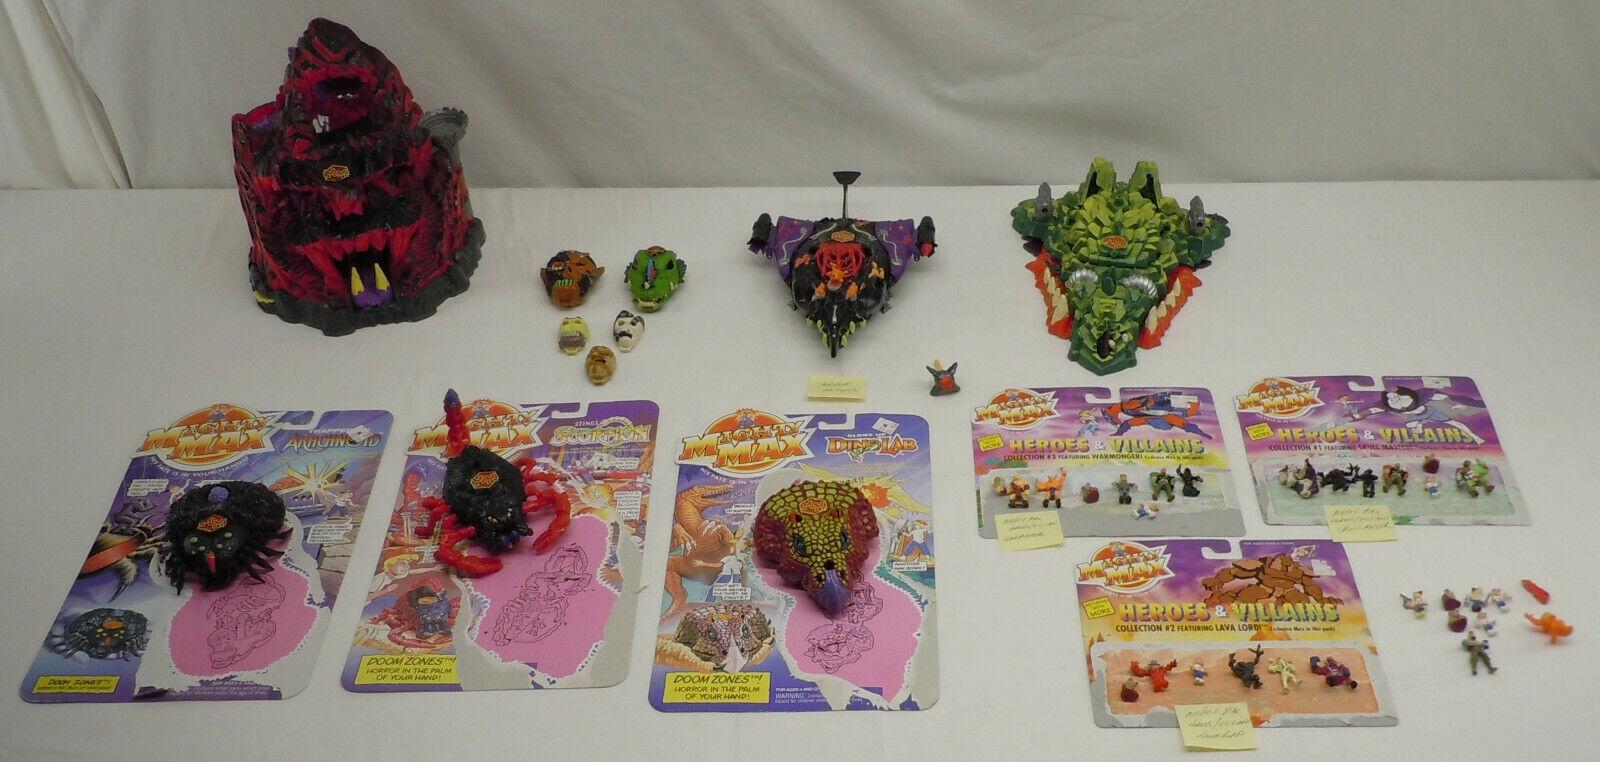 Mattel Mighty Max Skull Mtn Dragon Island Terror Talon Horror cabezas Jugarset Lote